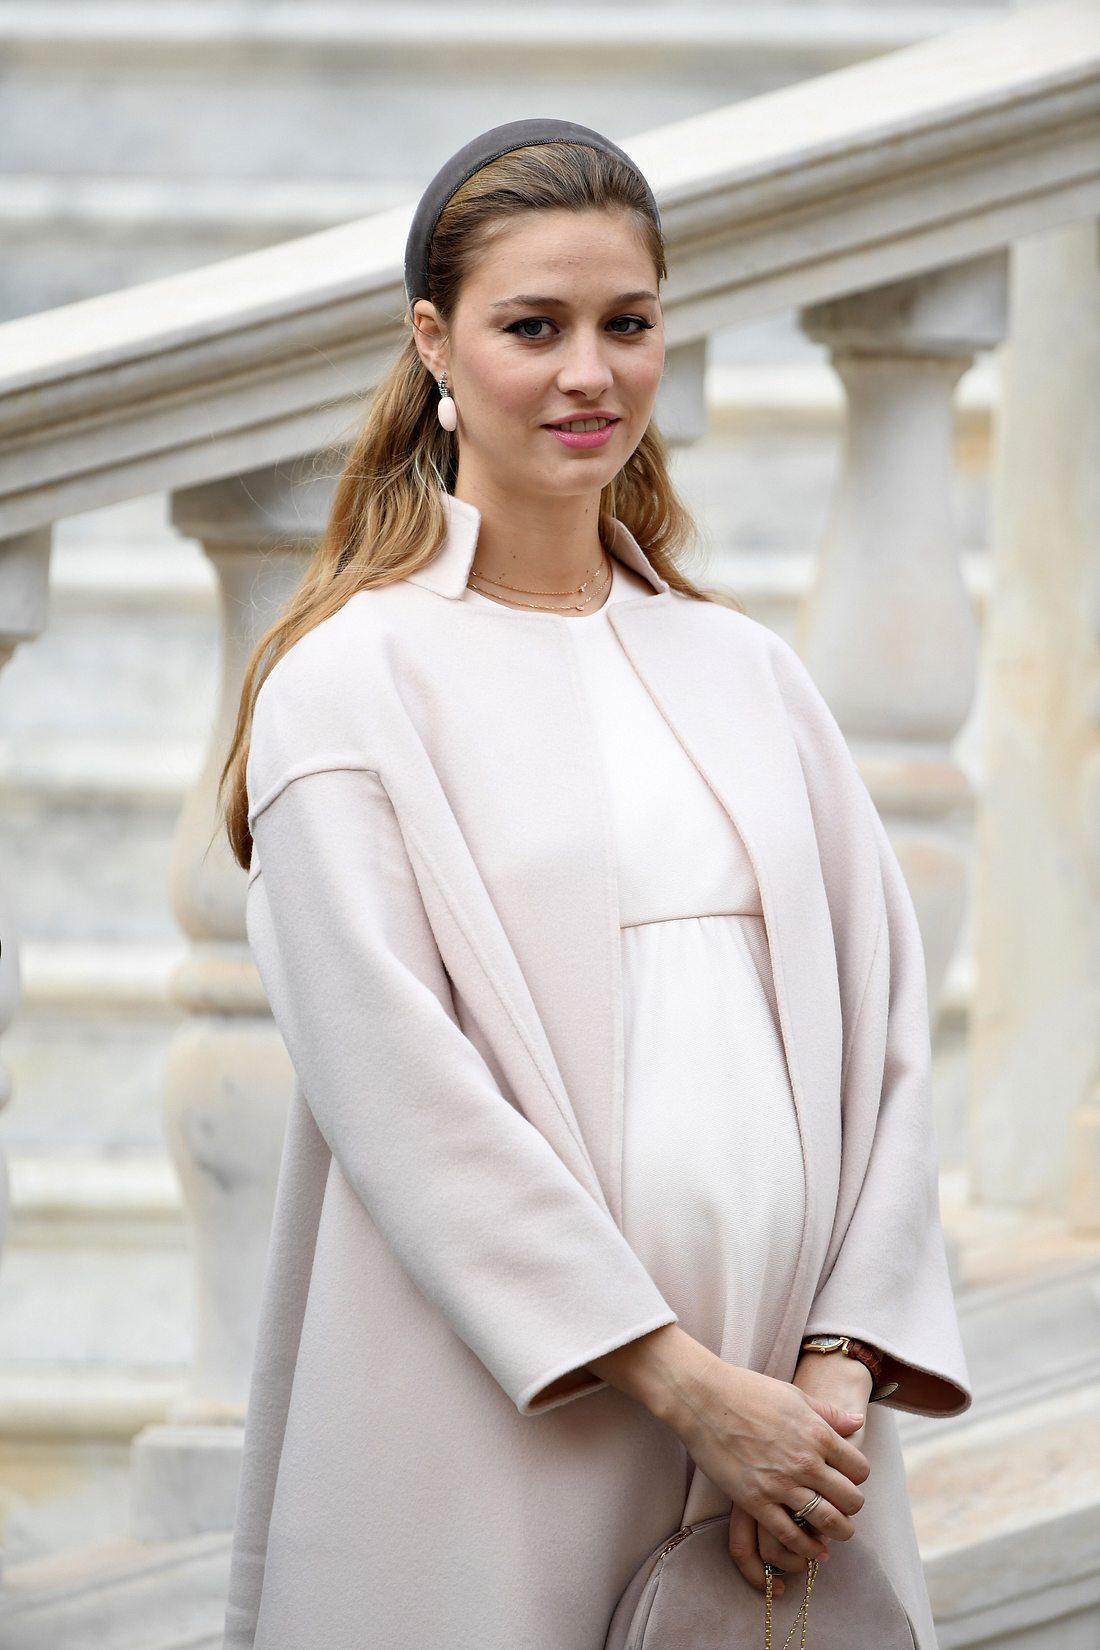 Beatrice Borromeo ist schwanger!